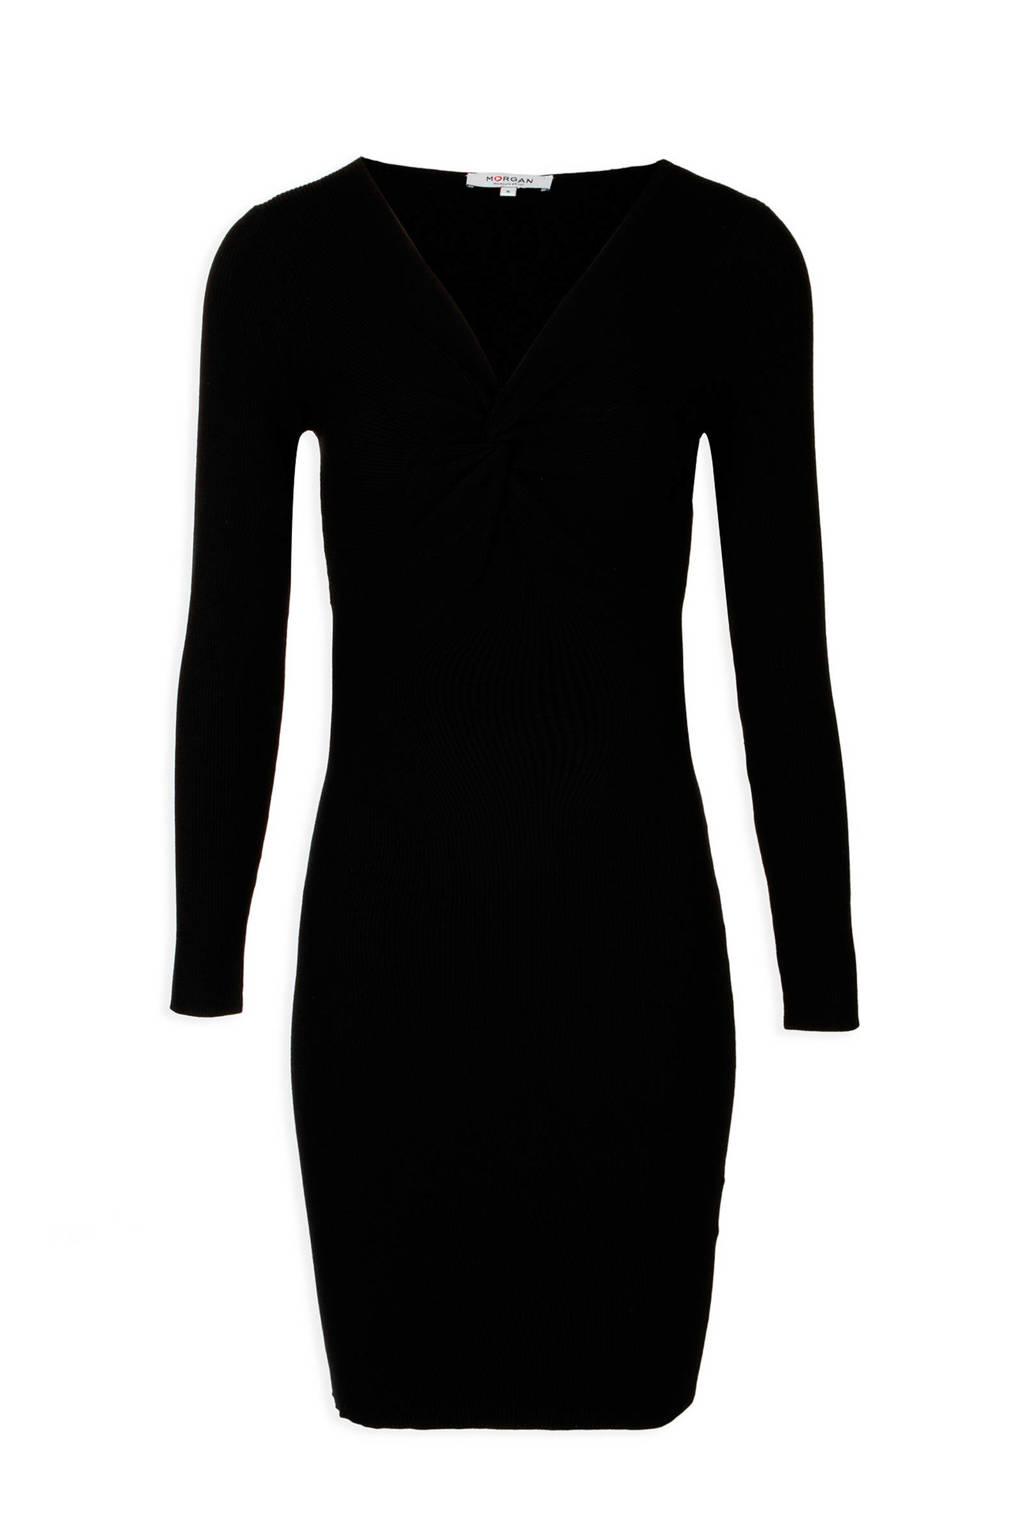 Morgan gebreide jurk met V-hals zwart, Zwart